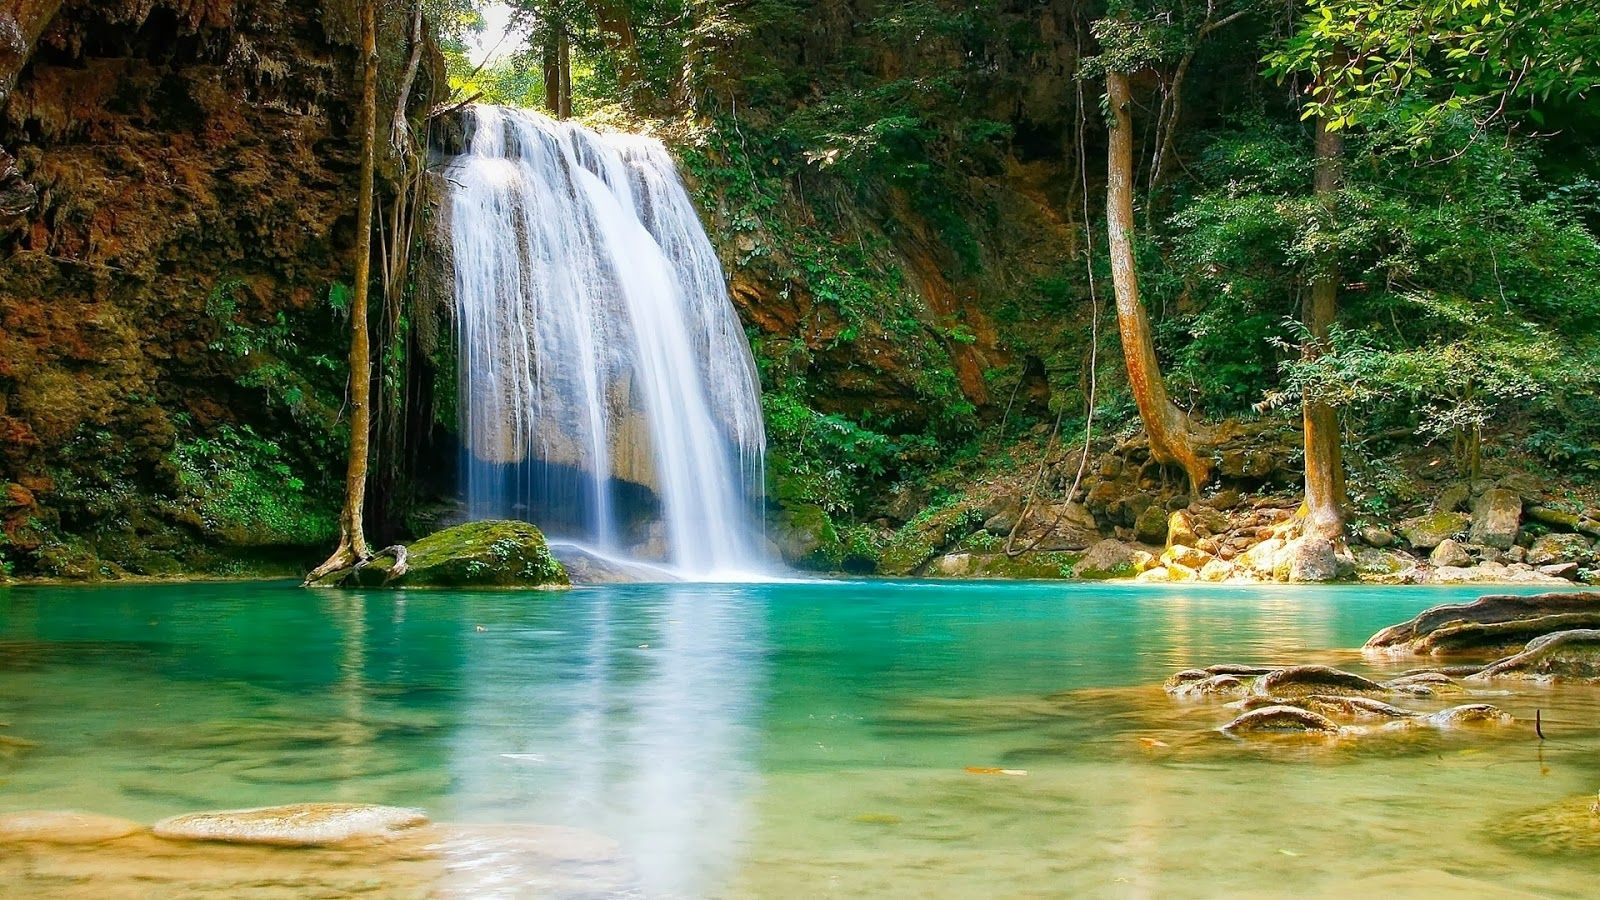 Pin by Lopušina Marijana on Waterfalls | Waterfall wallpaper, Forest waterfall, Nature wallpaper